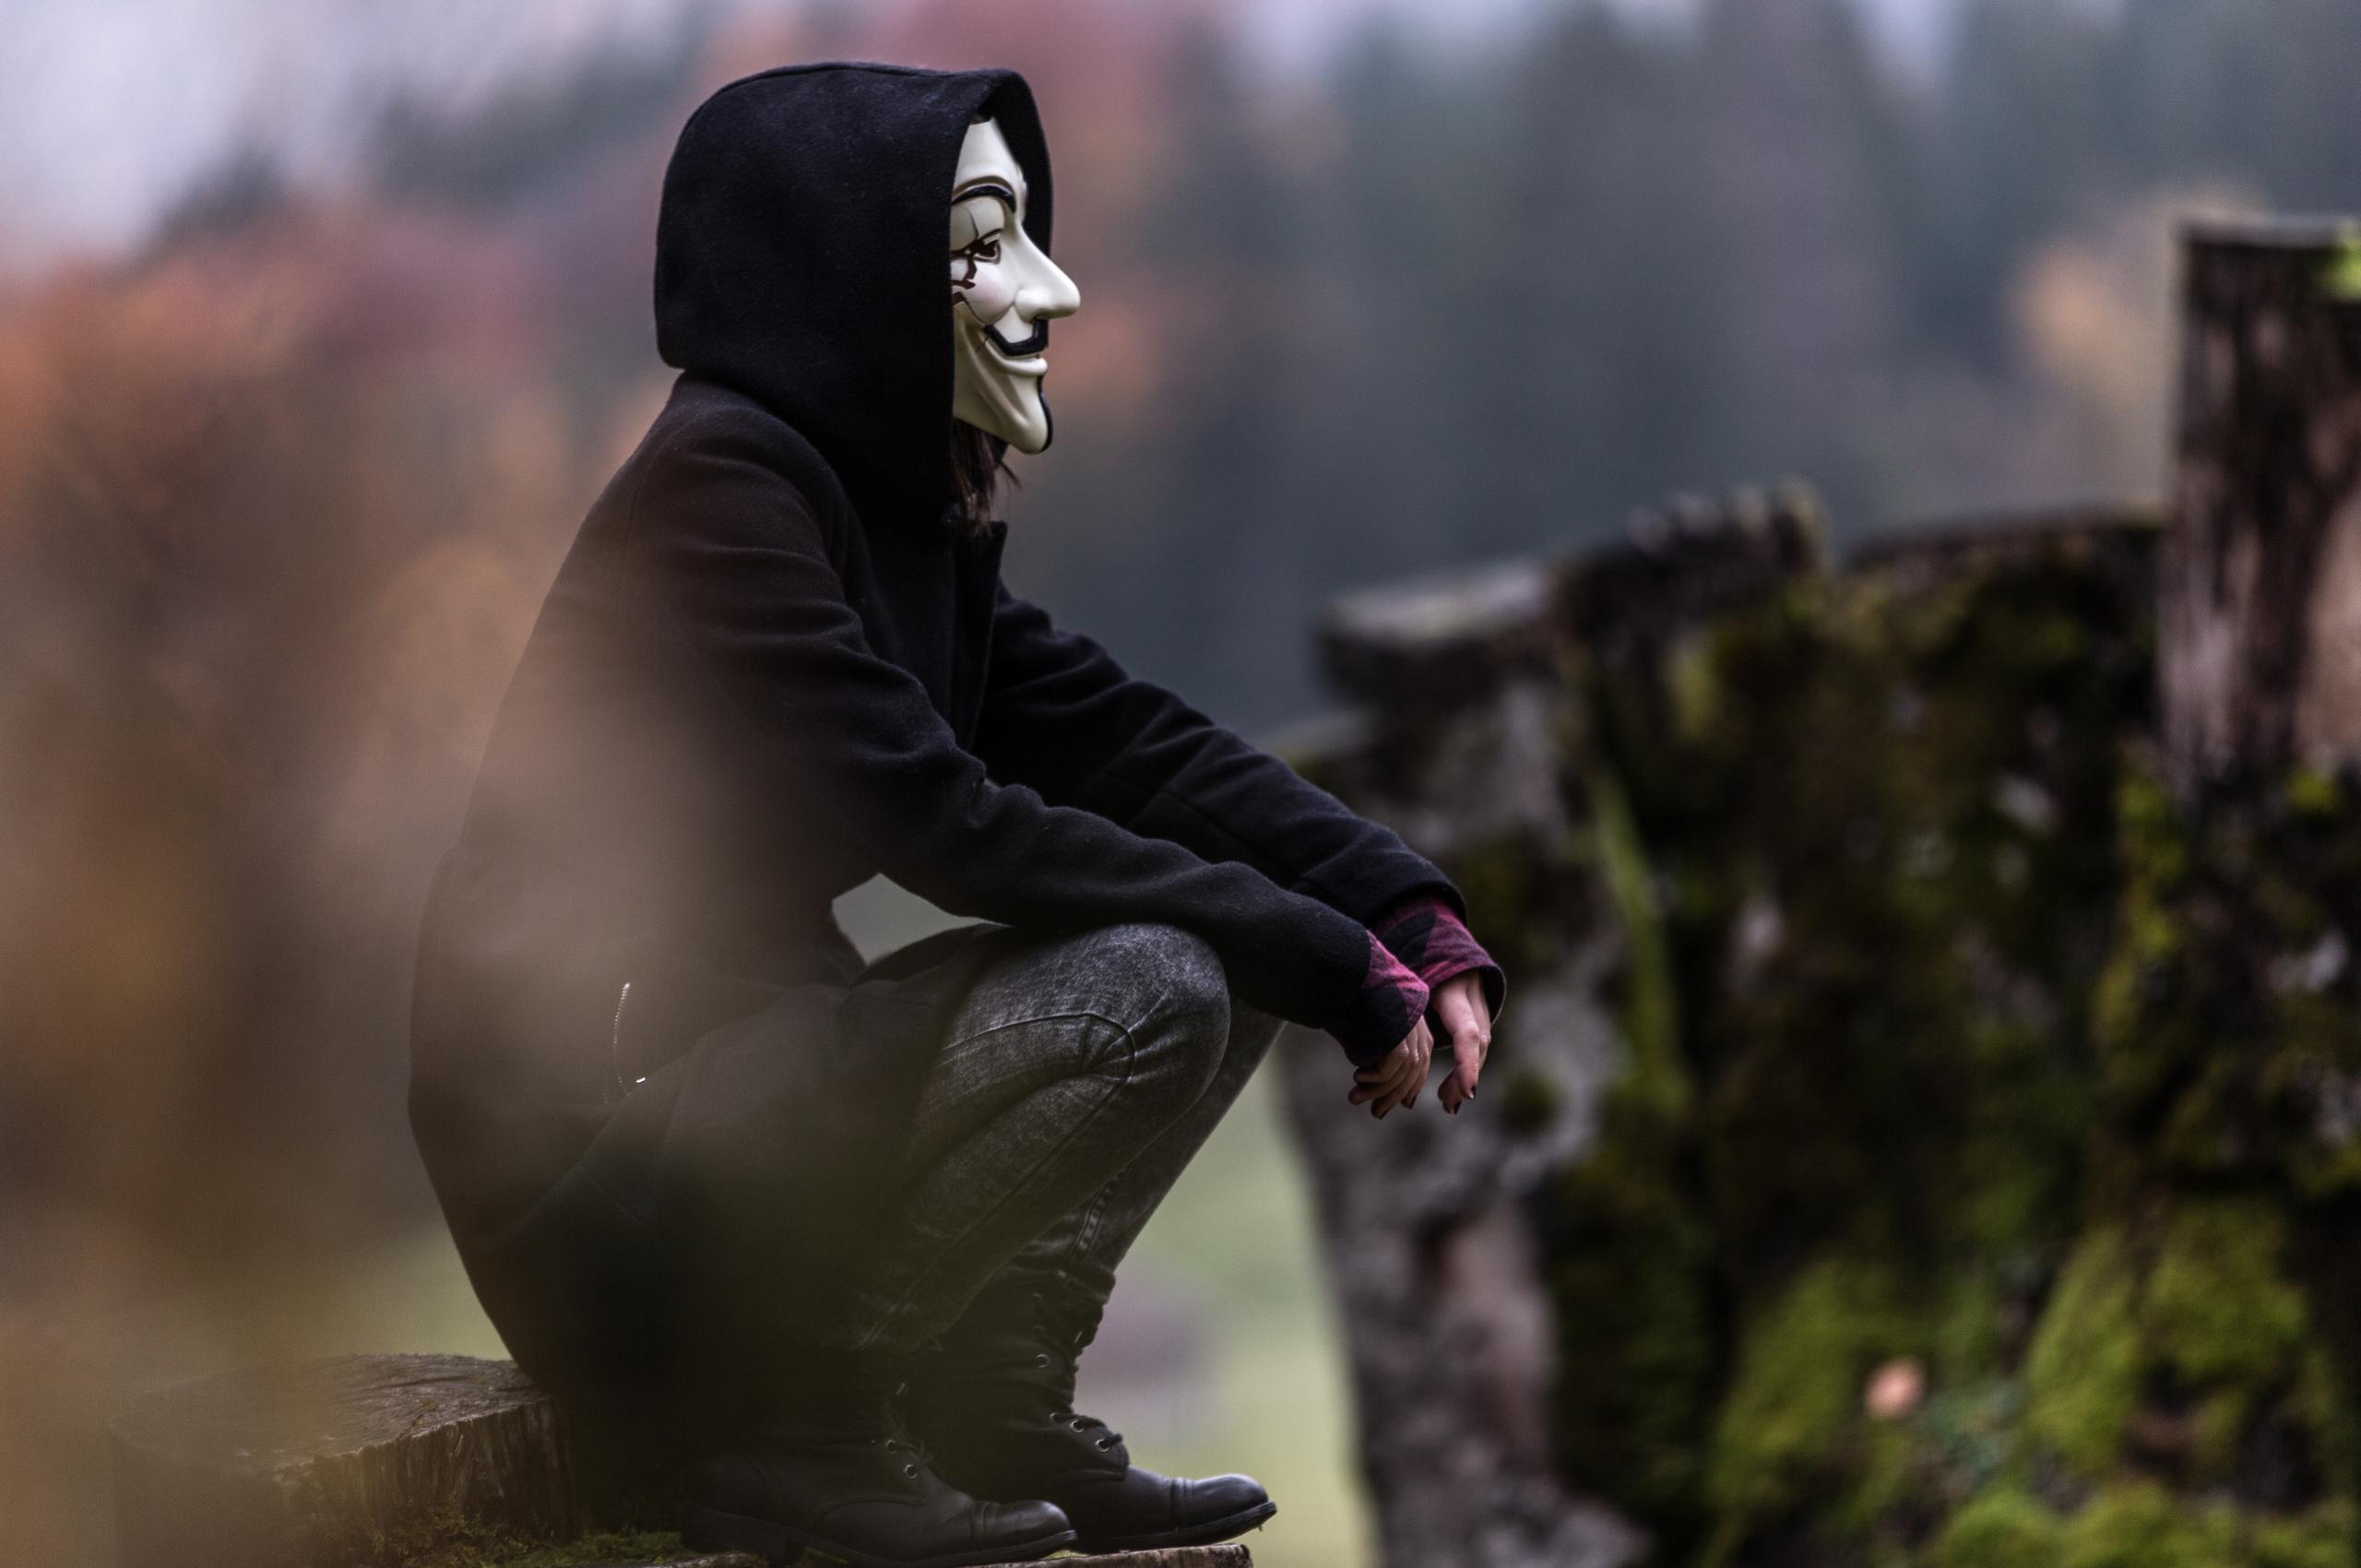 anonymous-mask-guy-id.jpg